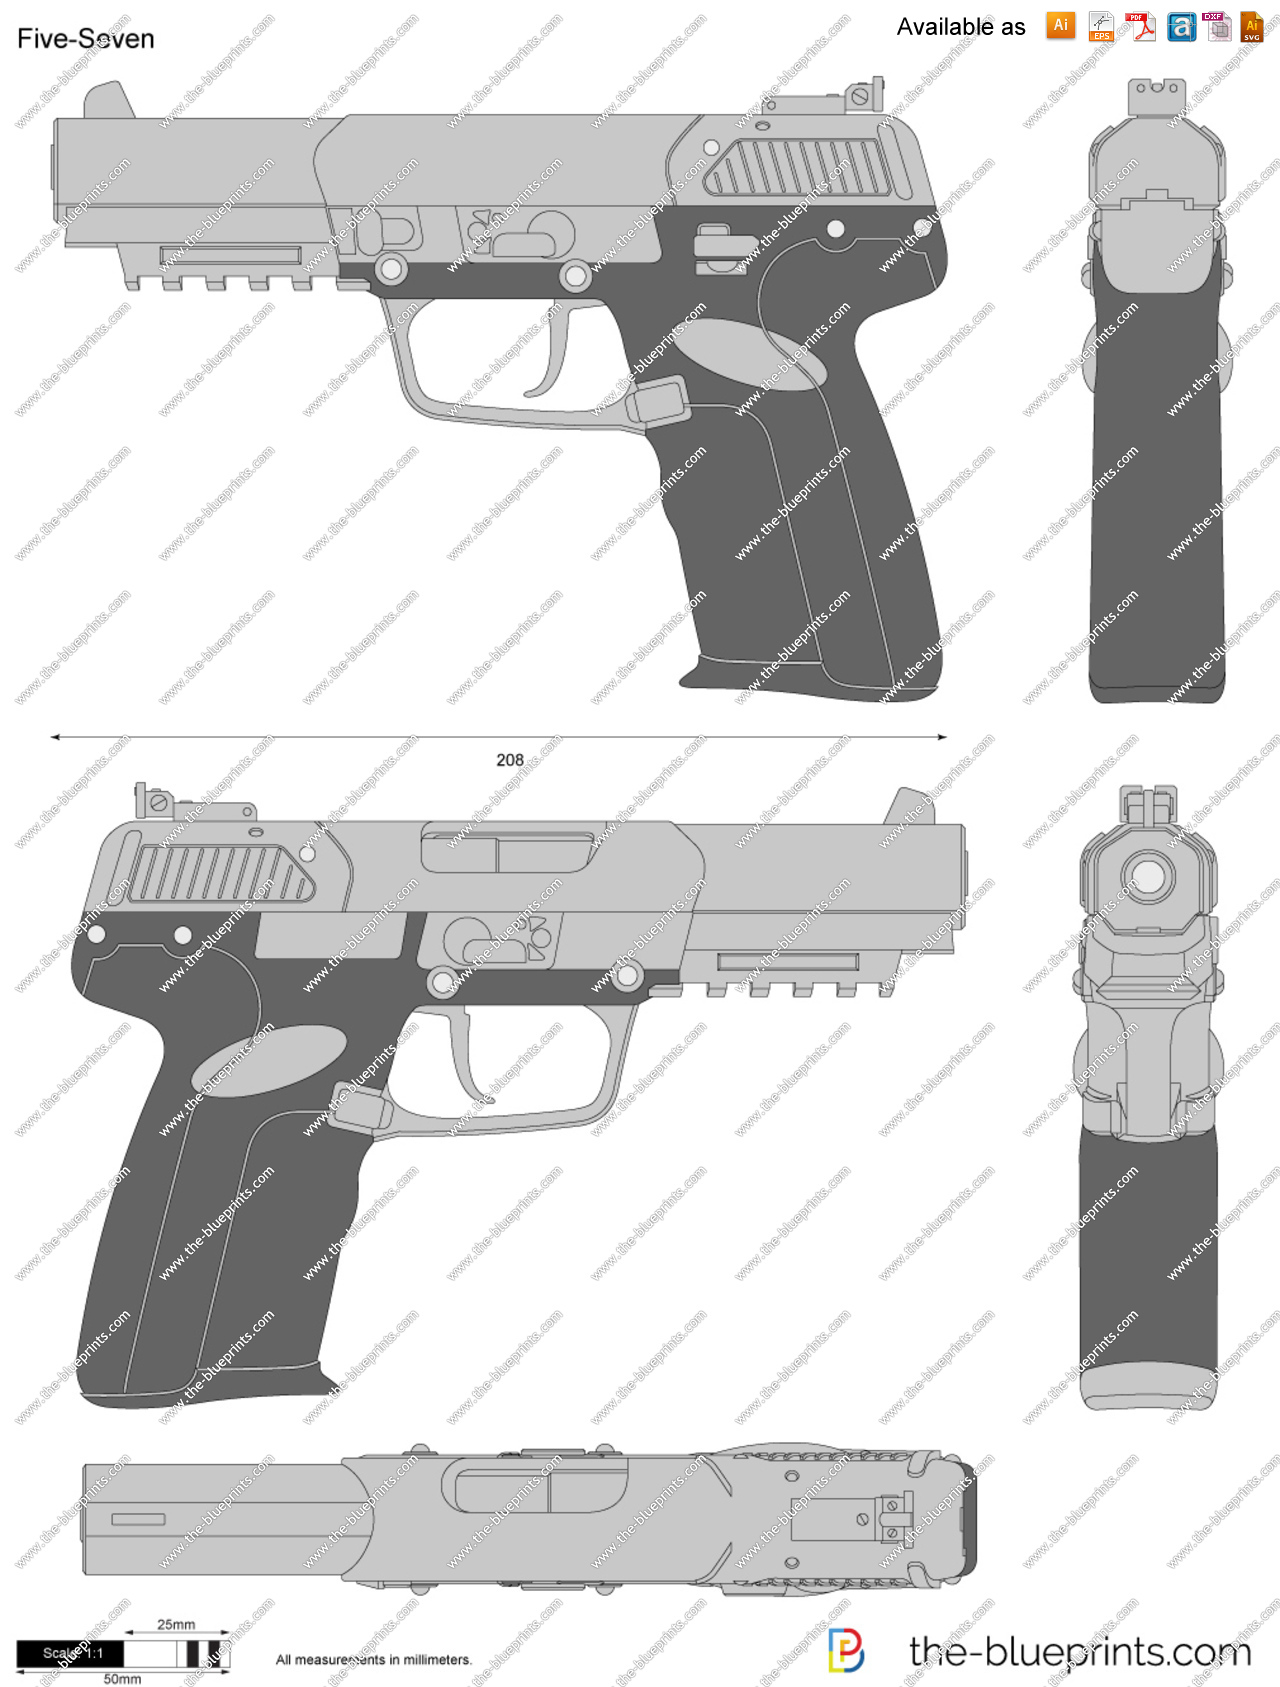 Five seven clipart image black and white Five-Seven vector drawing image black and white